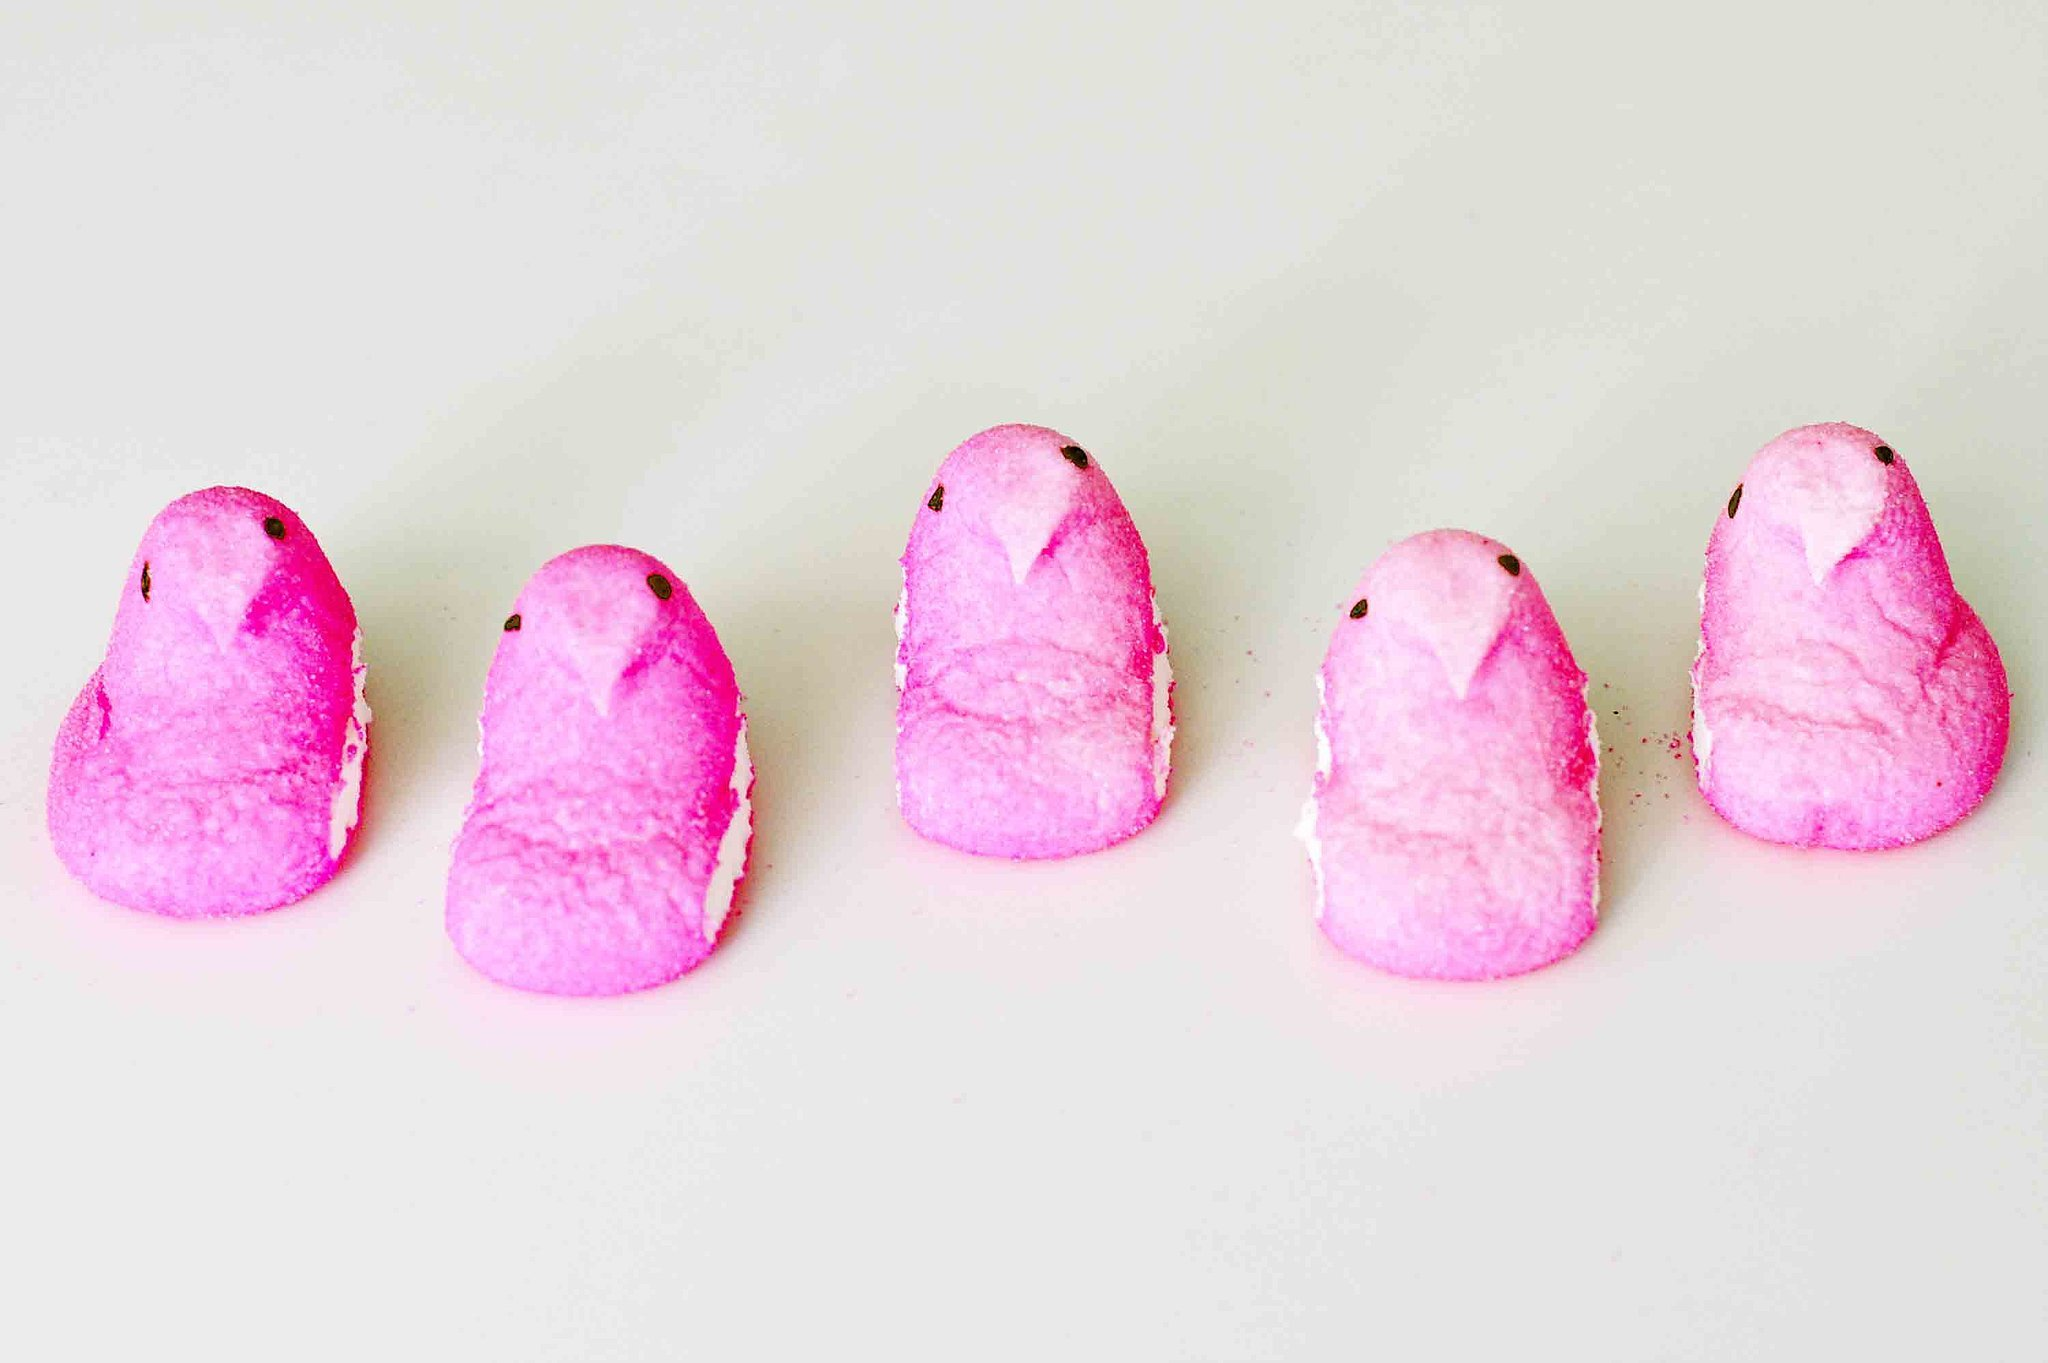 Pink chick peeps individual